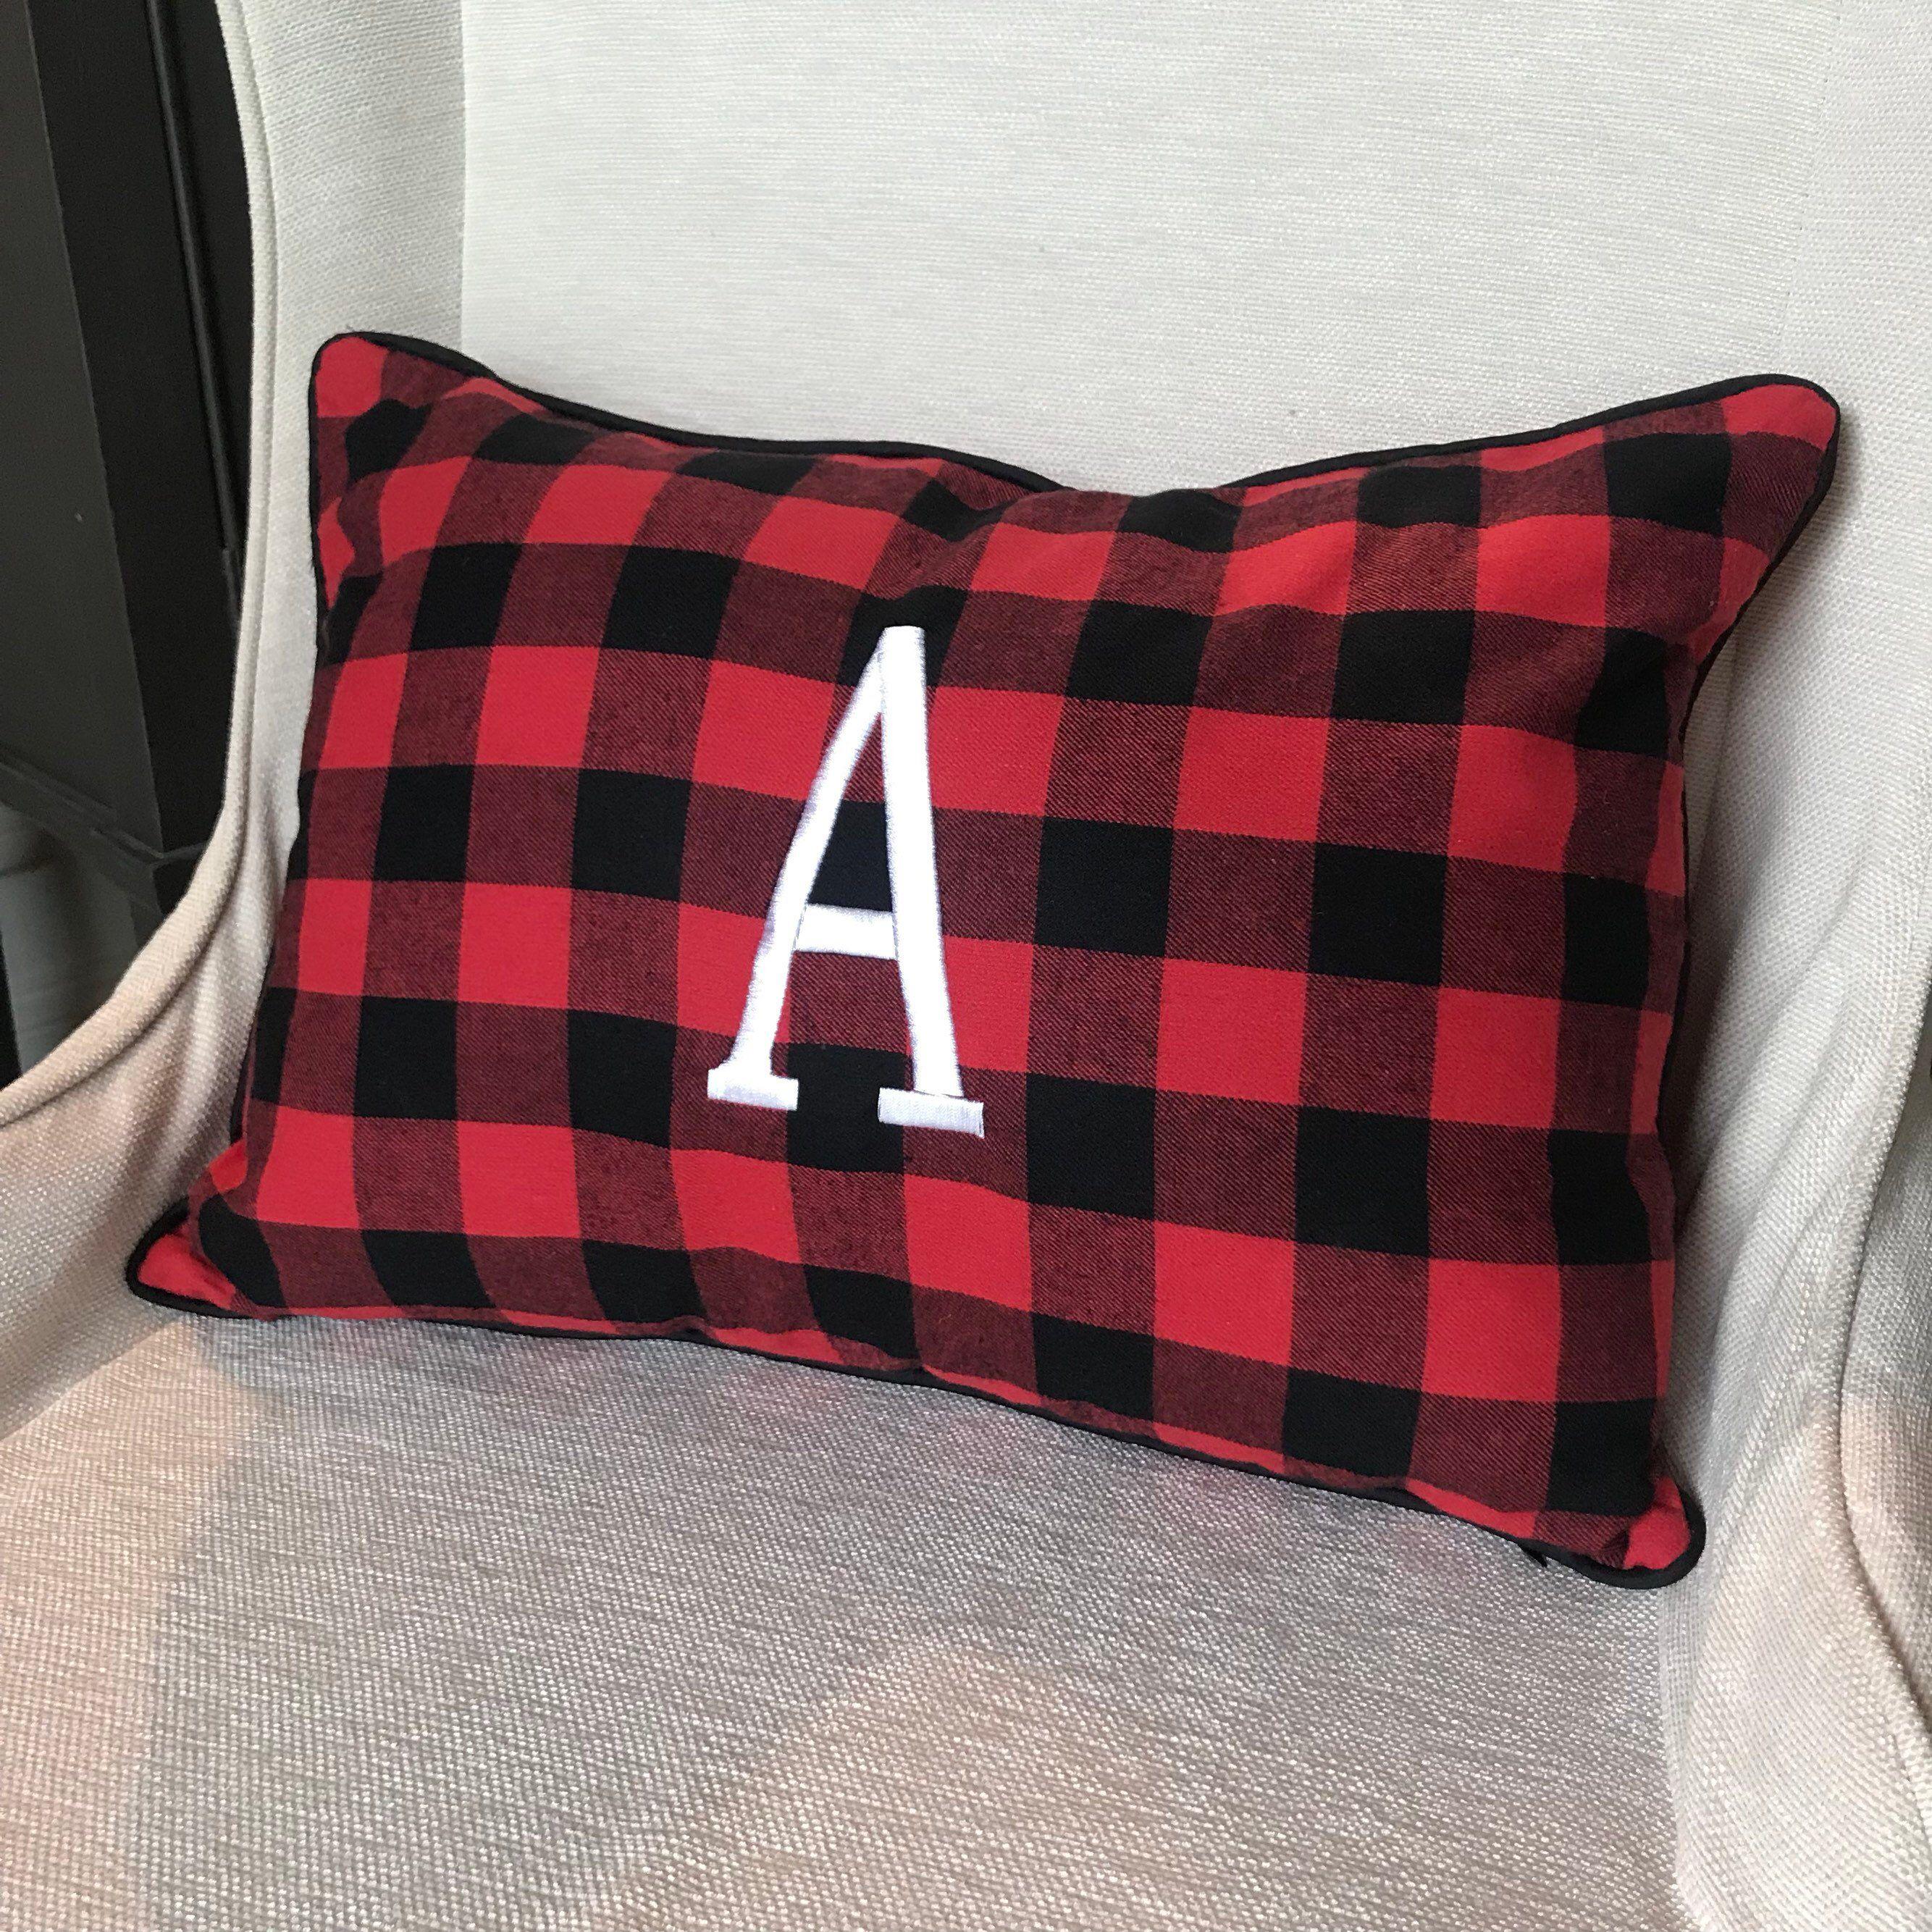 Monogrammed Buffalo Plaid Pillow Buffalo Plaid Red Lumbar Etsy Buffalo Plaid Pillows Plaid Pillows Christmas Plaid Pillow #red #buffalo #plaid #living #room